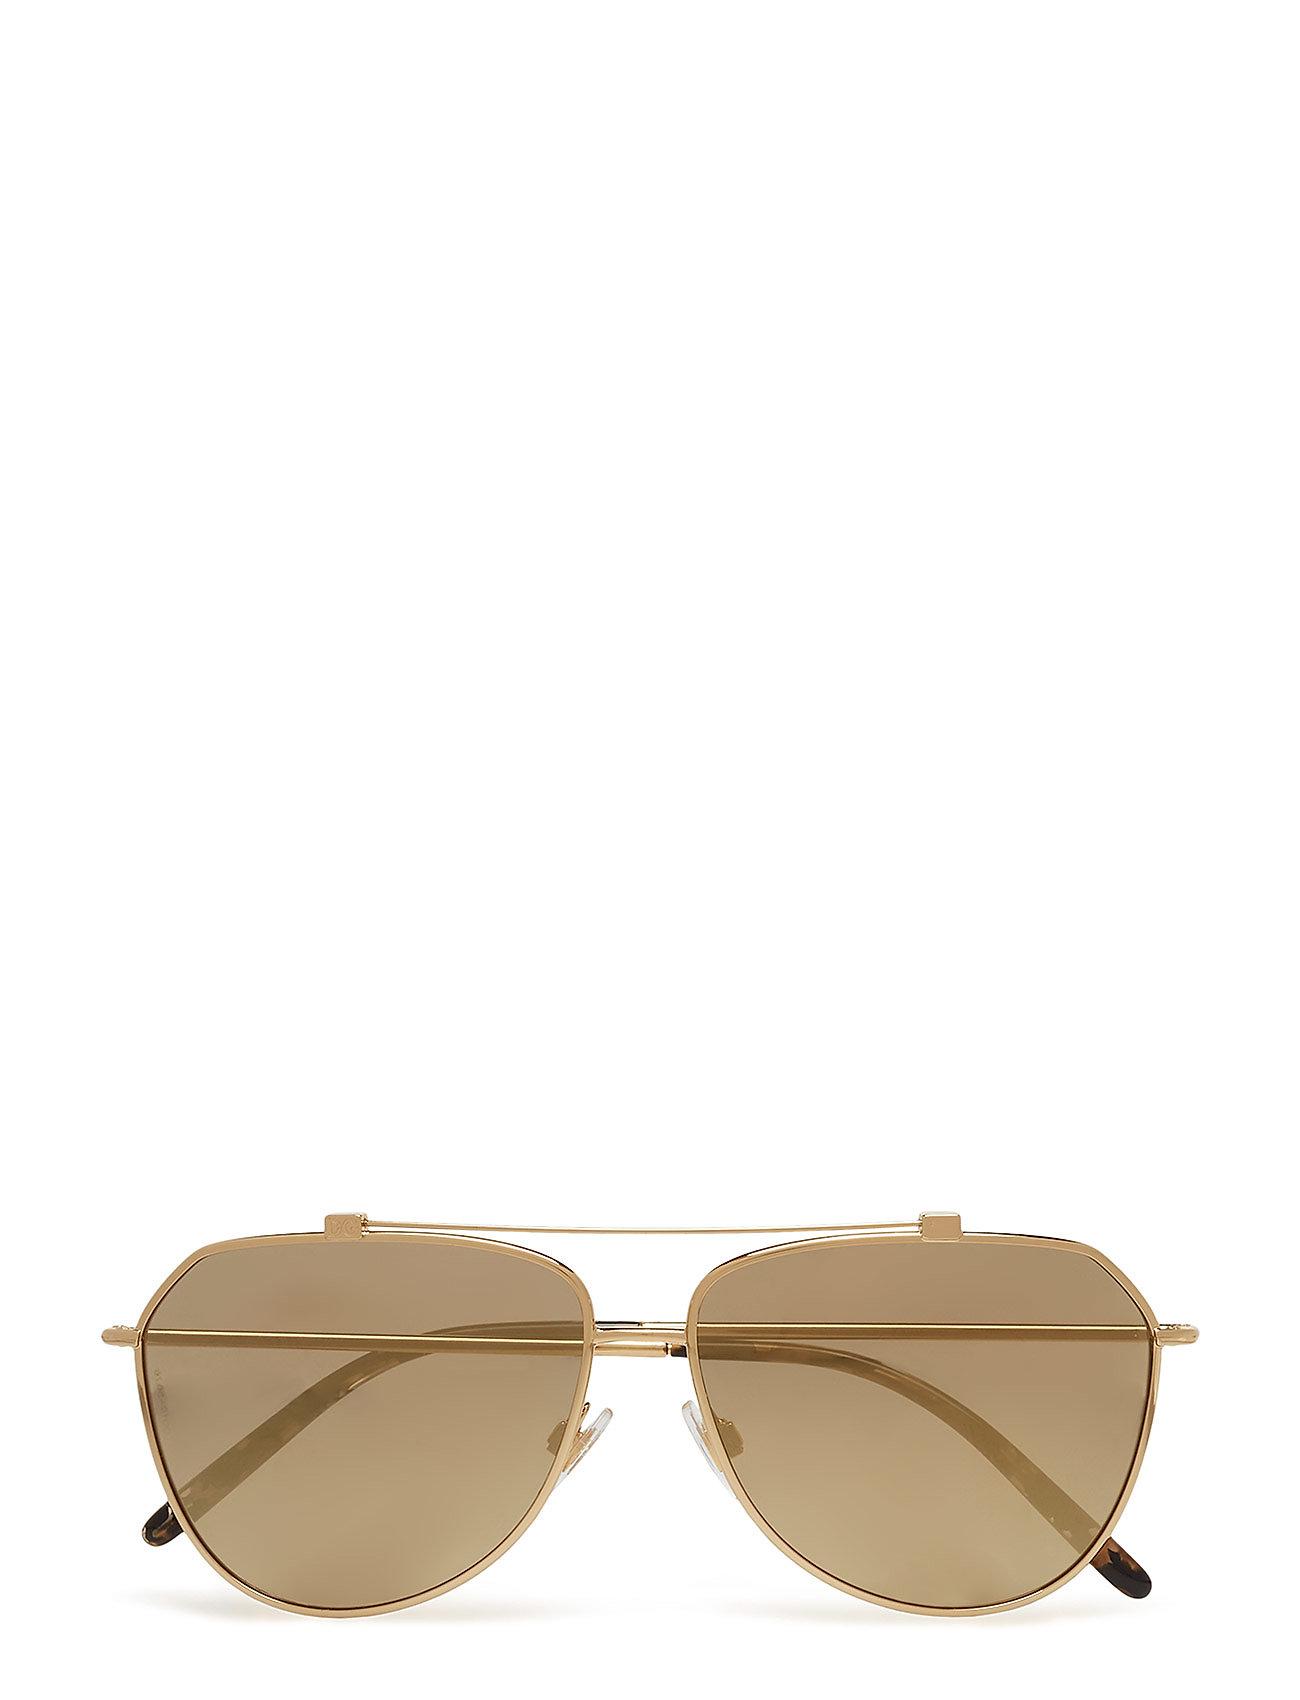 DOLCE & GABBANA Women'S Sunglasses Pilotensonnenbrille Sonnenbrille Gold DOLCE & GABBANA SUNGLASSES